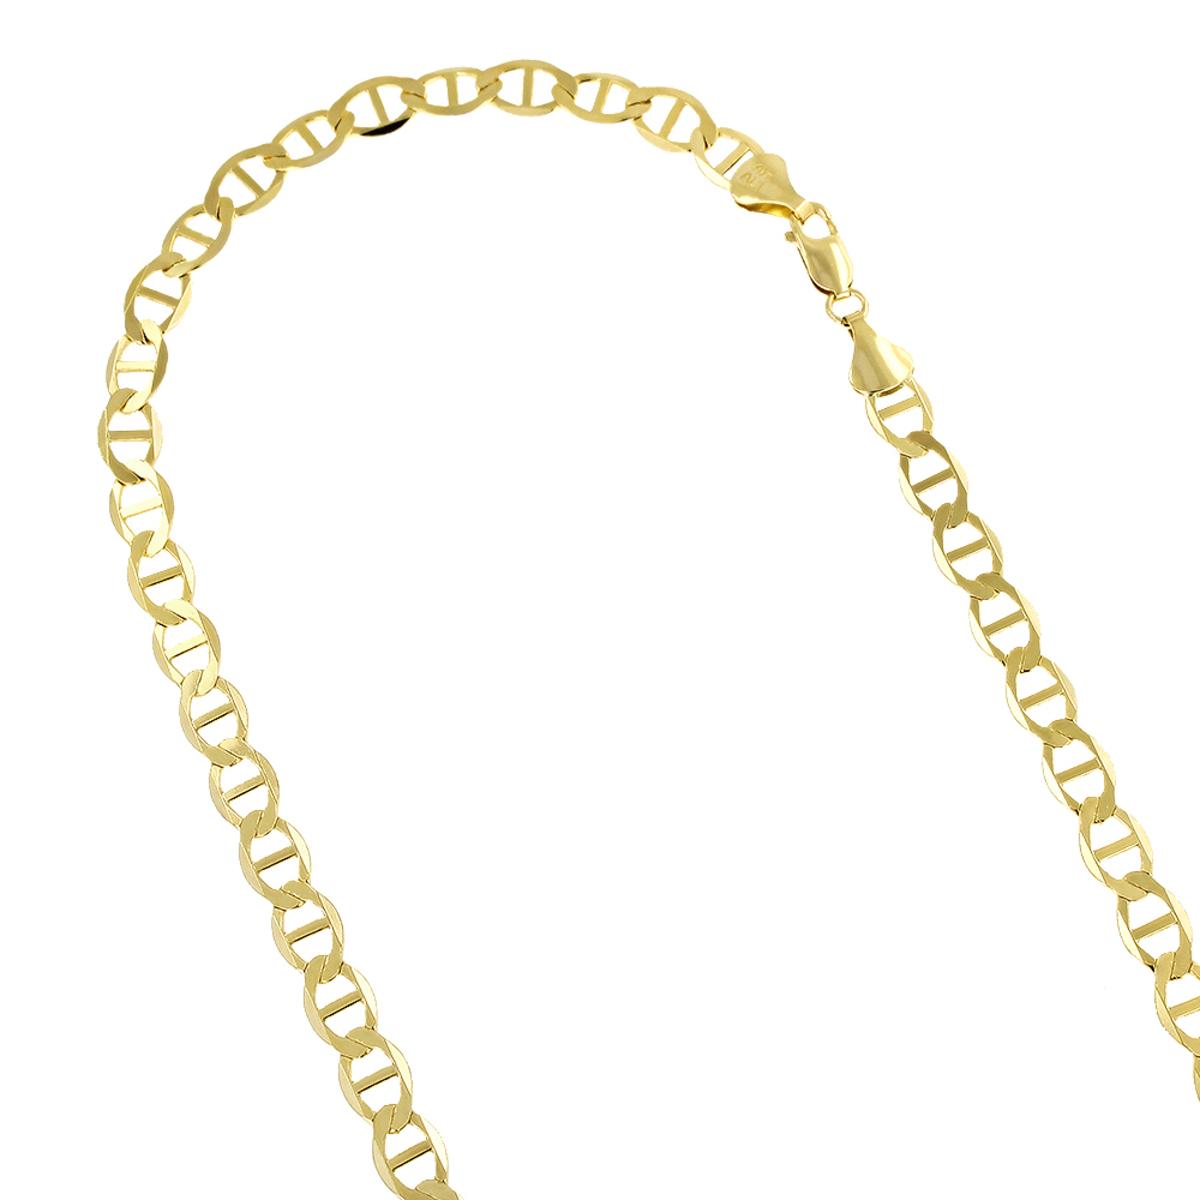 LUXURMAN Solid 14k Gold Mariner Chain For Men & Women 6.5mm Wide